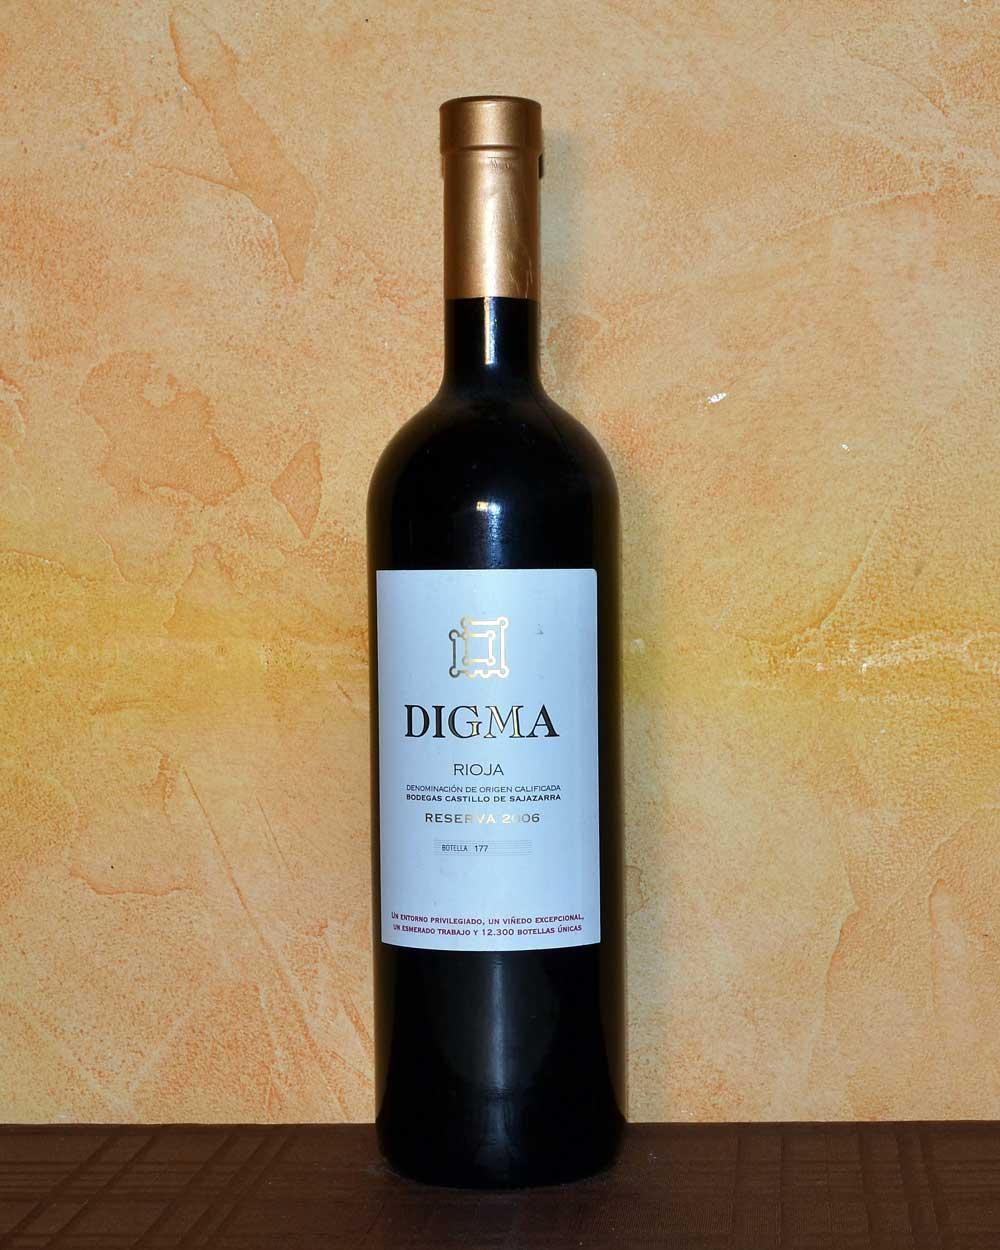 Digma Reserve 2006